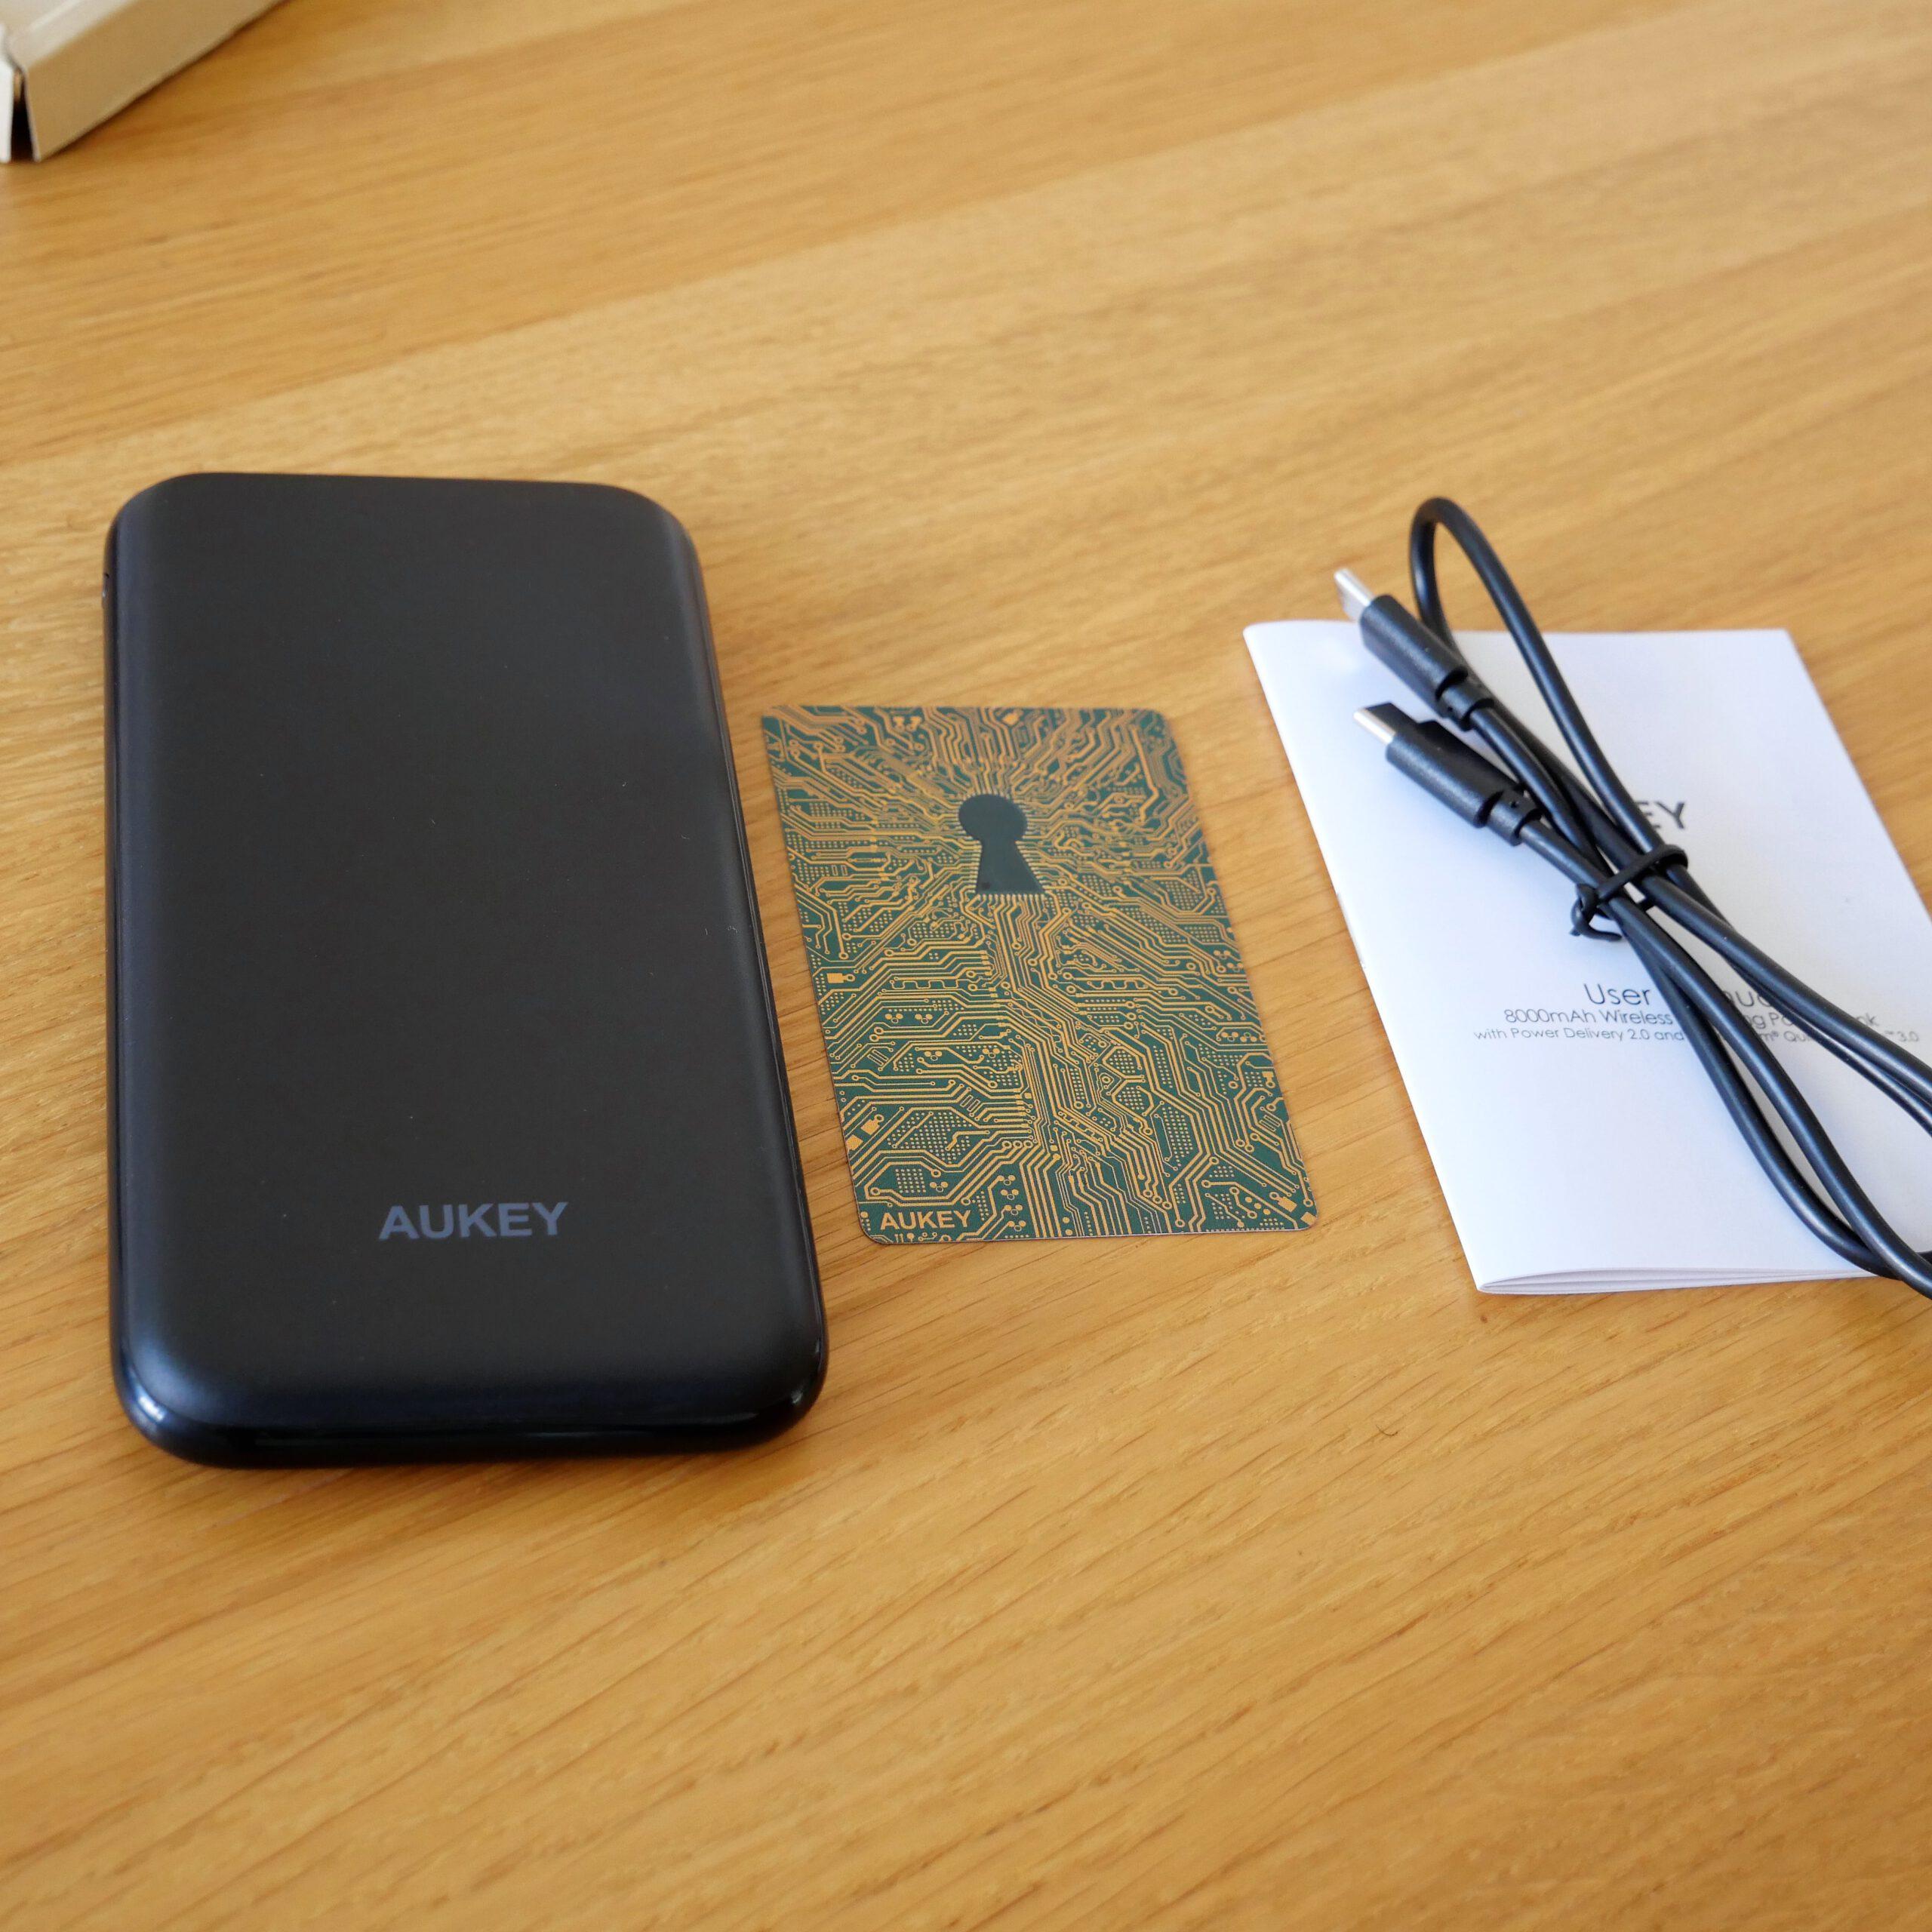 Aukey PB-Y25